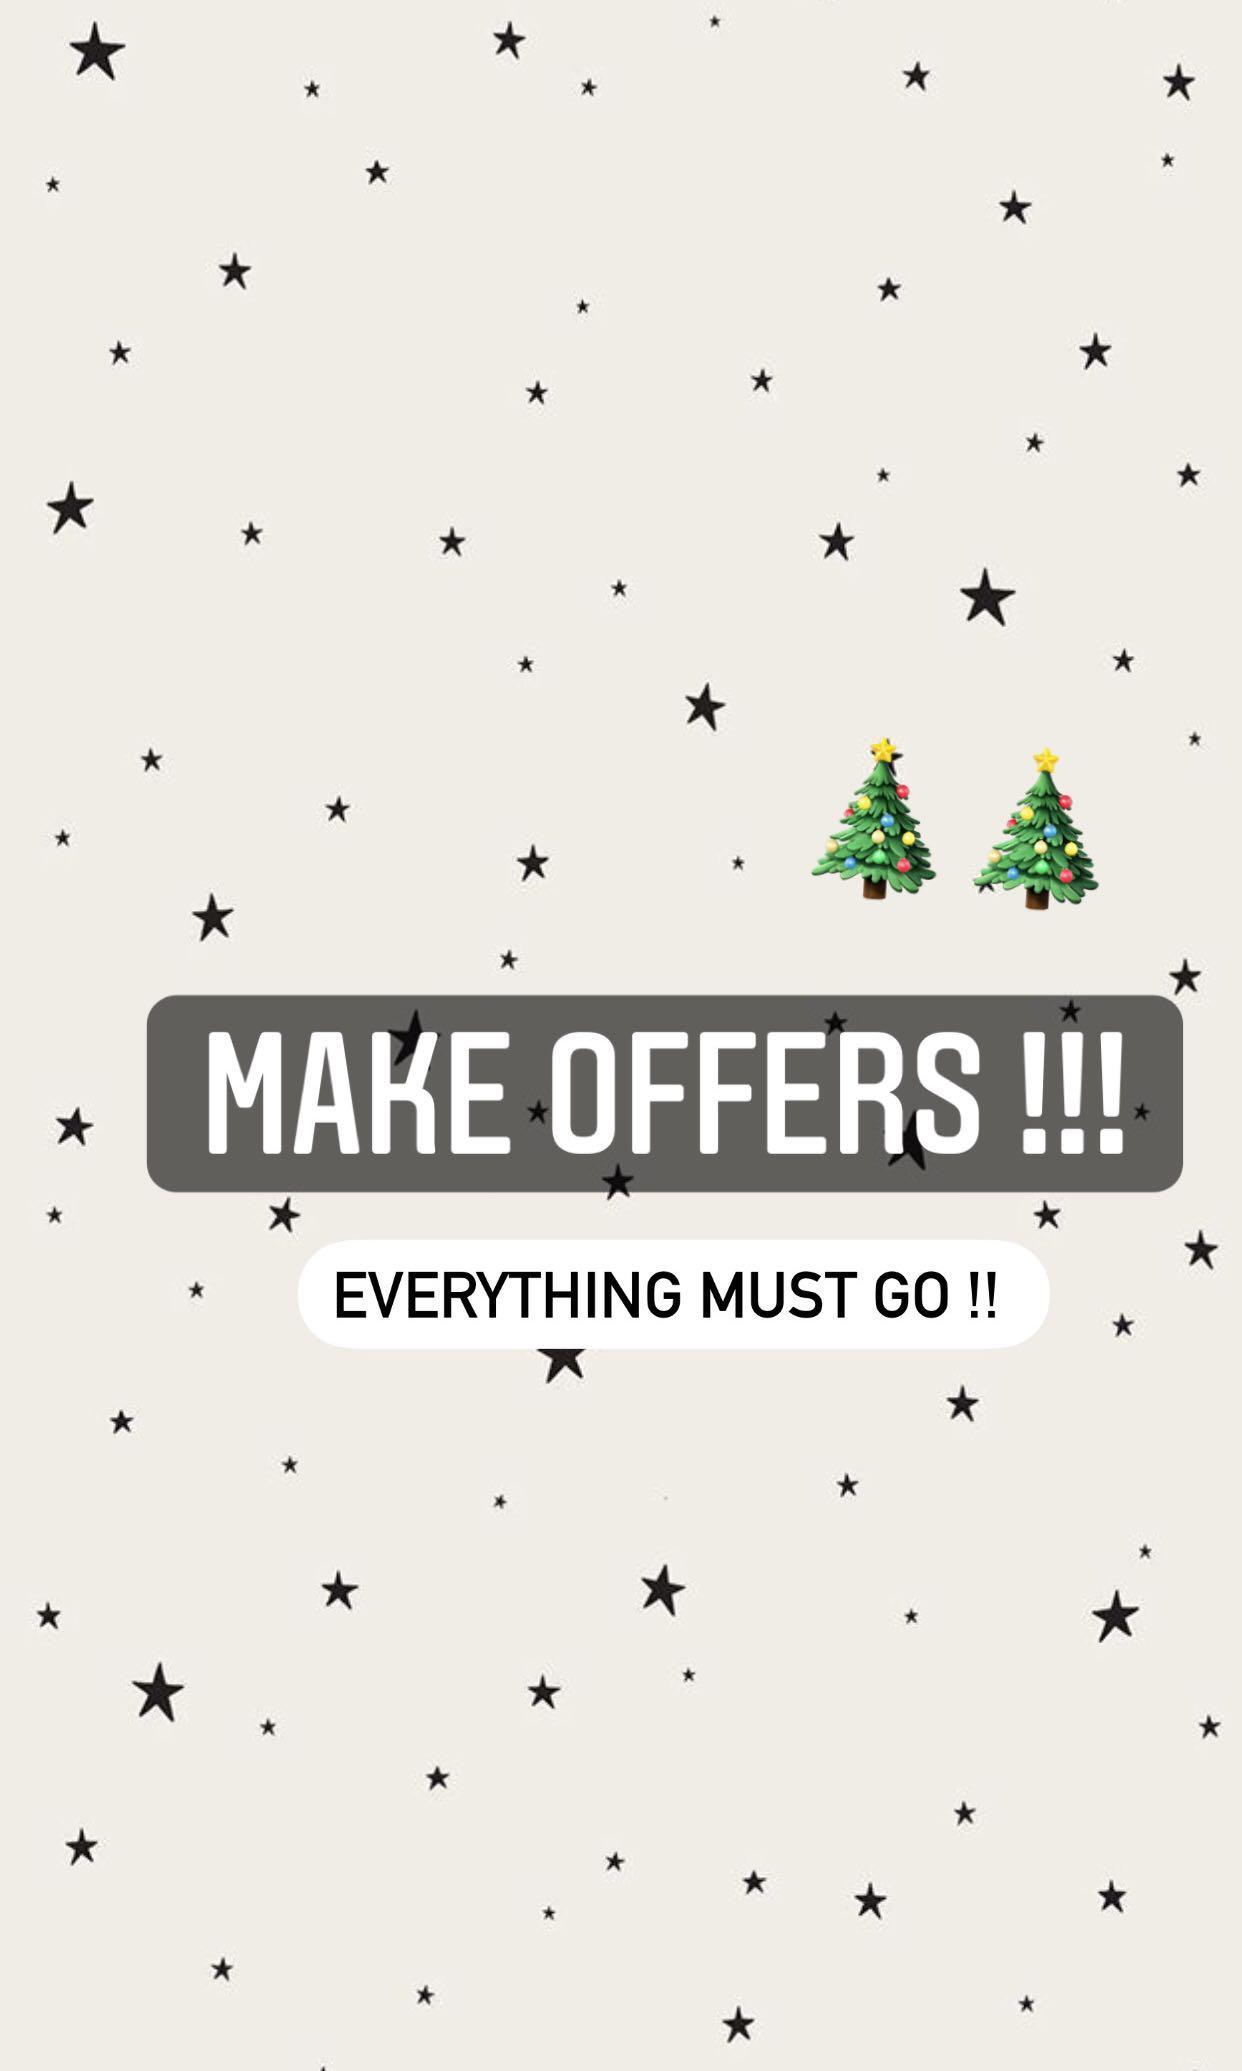 Make offers!!